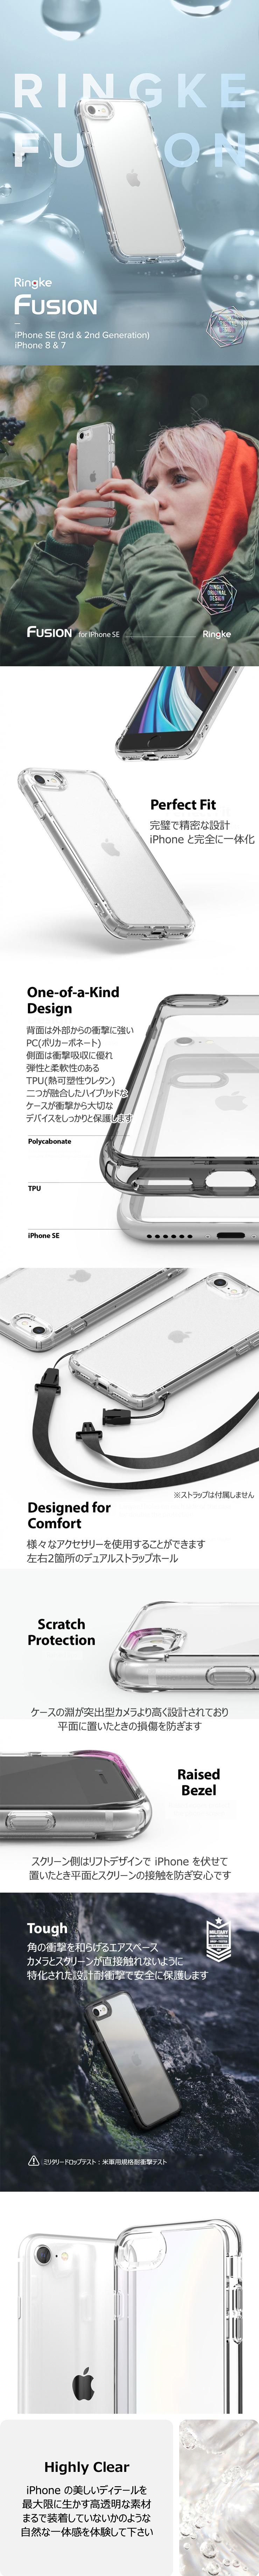 Ringke Fusion iPhone SE2